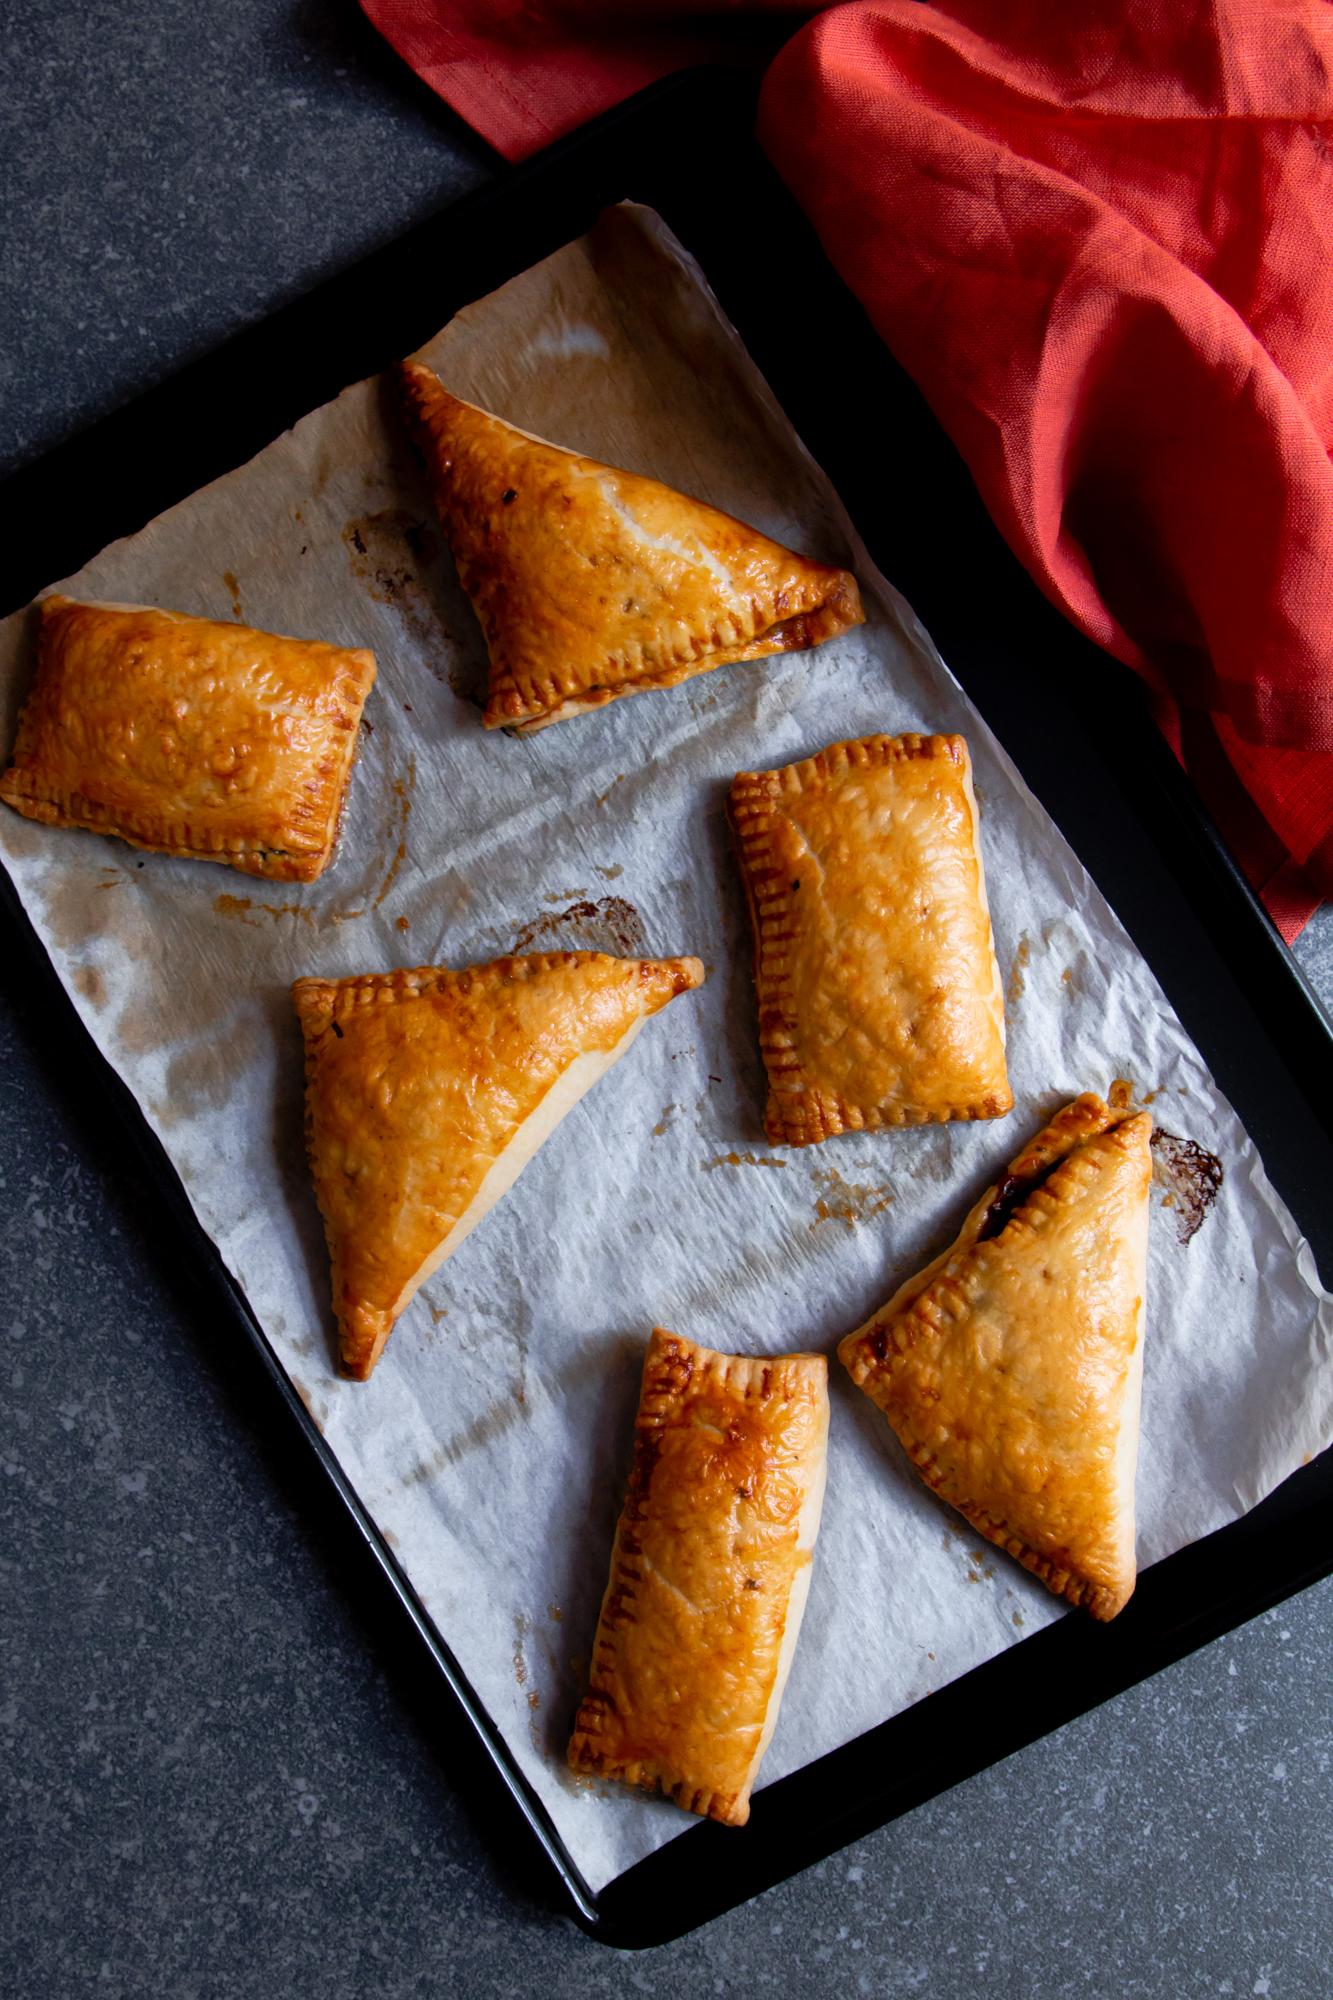 巴库拉羊乳酪和pinutes handpies -3.jpg